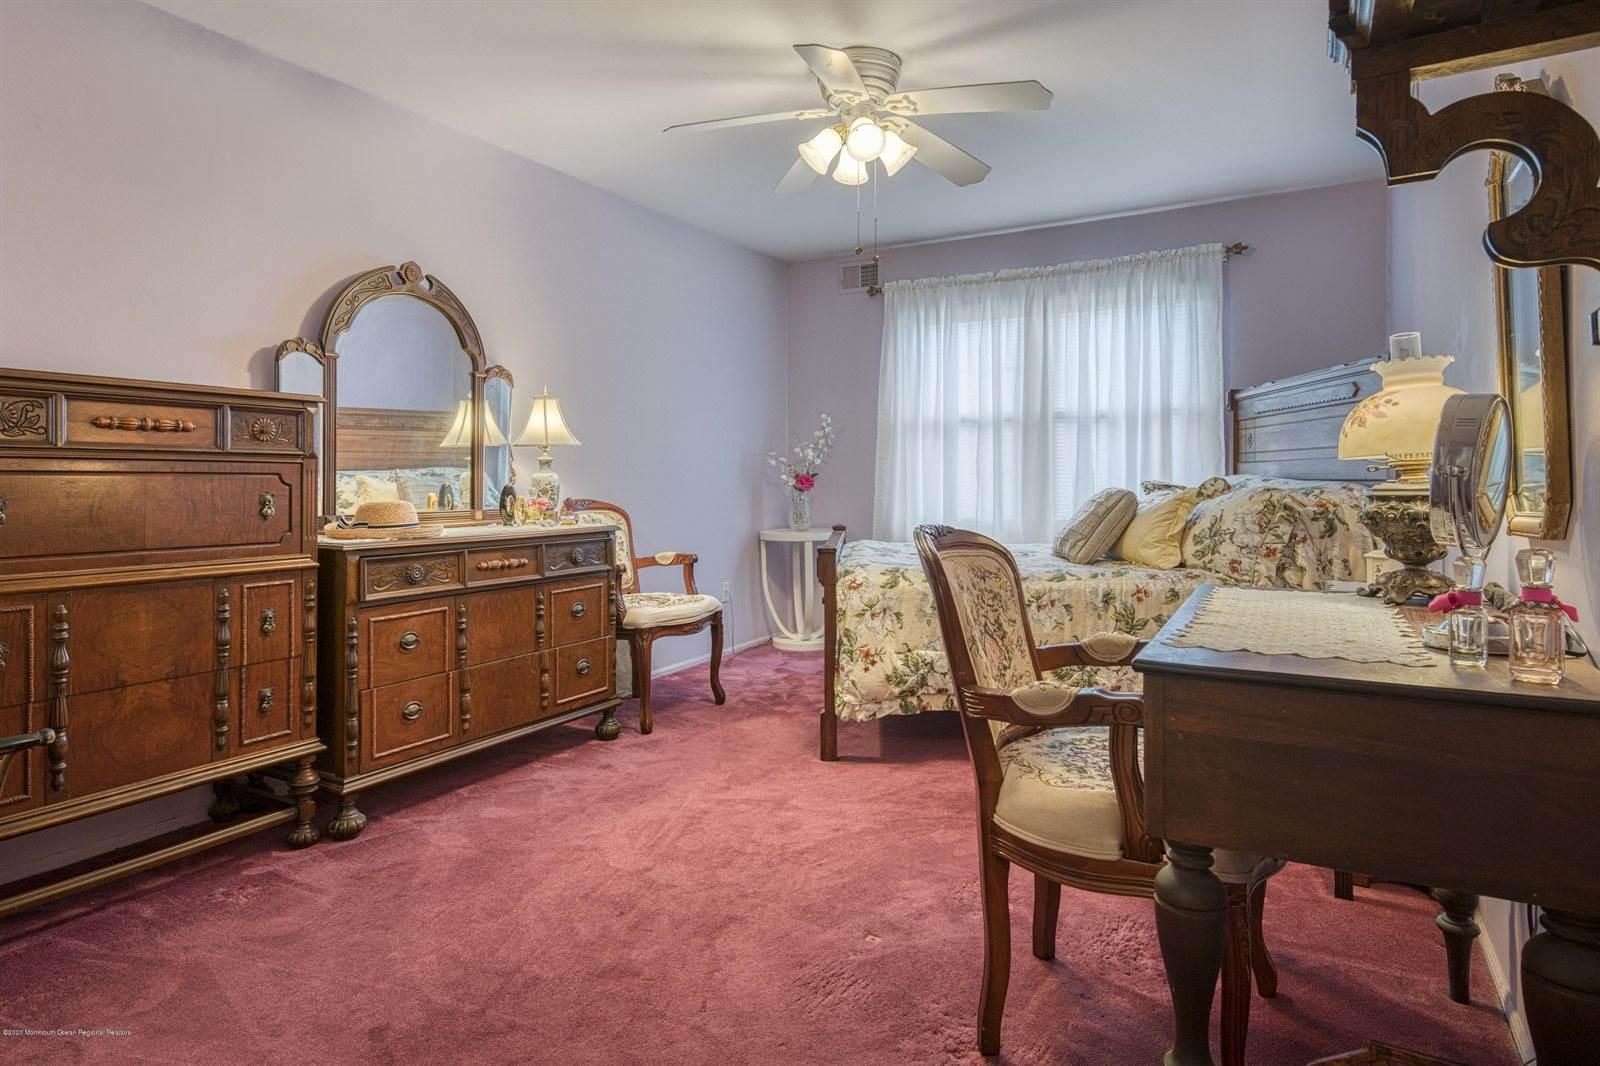 191 Victoria Court, #1000, Lakewood, NJ 08701